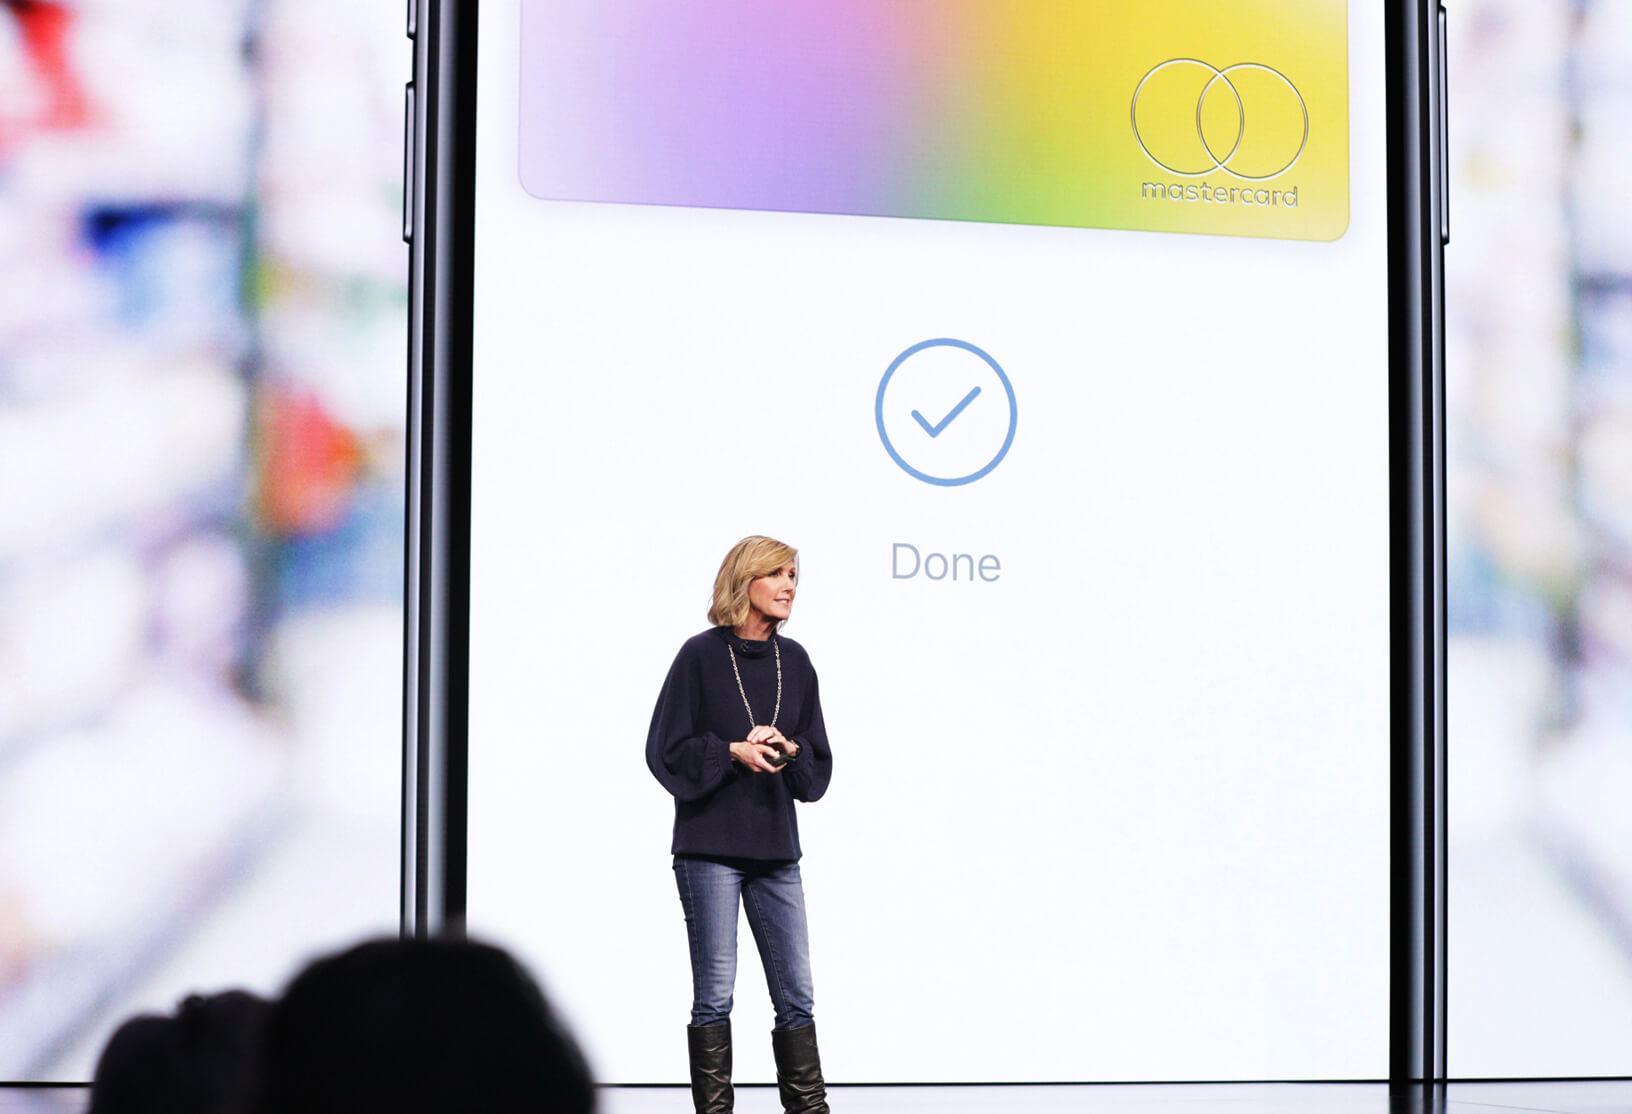 Apples-keynote-event_Jennifer_Bailey_introduces_apple_card-03252019